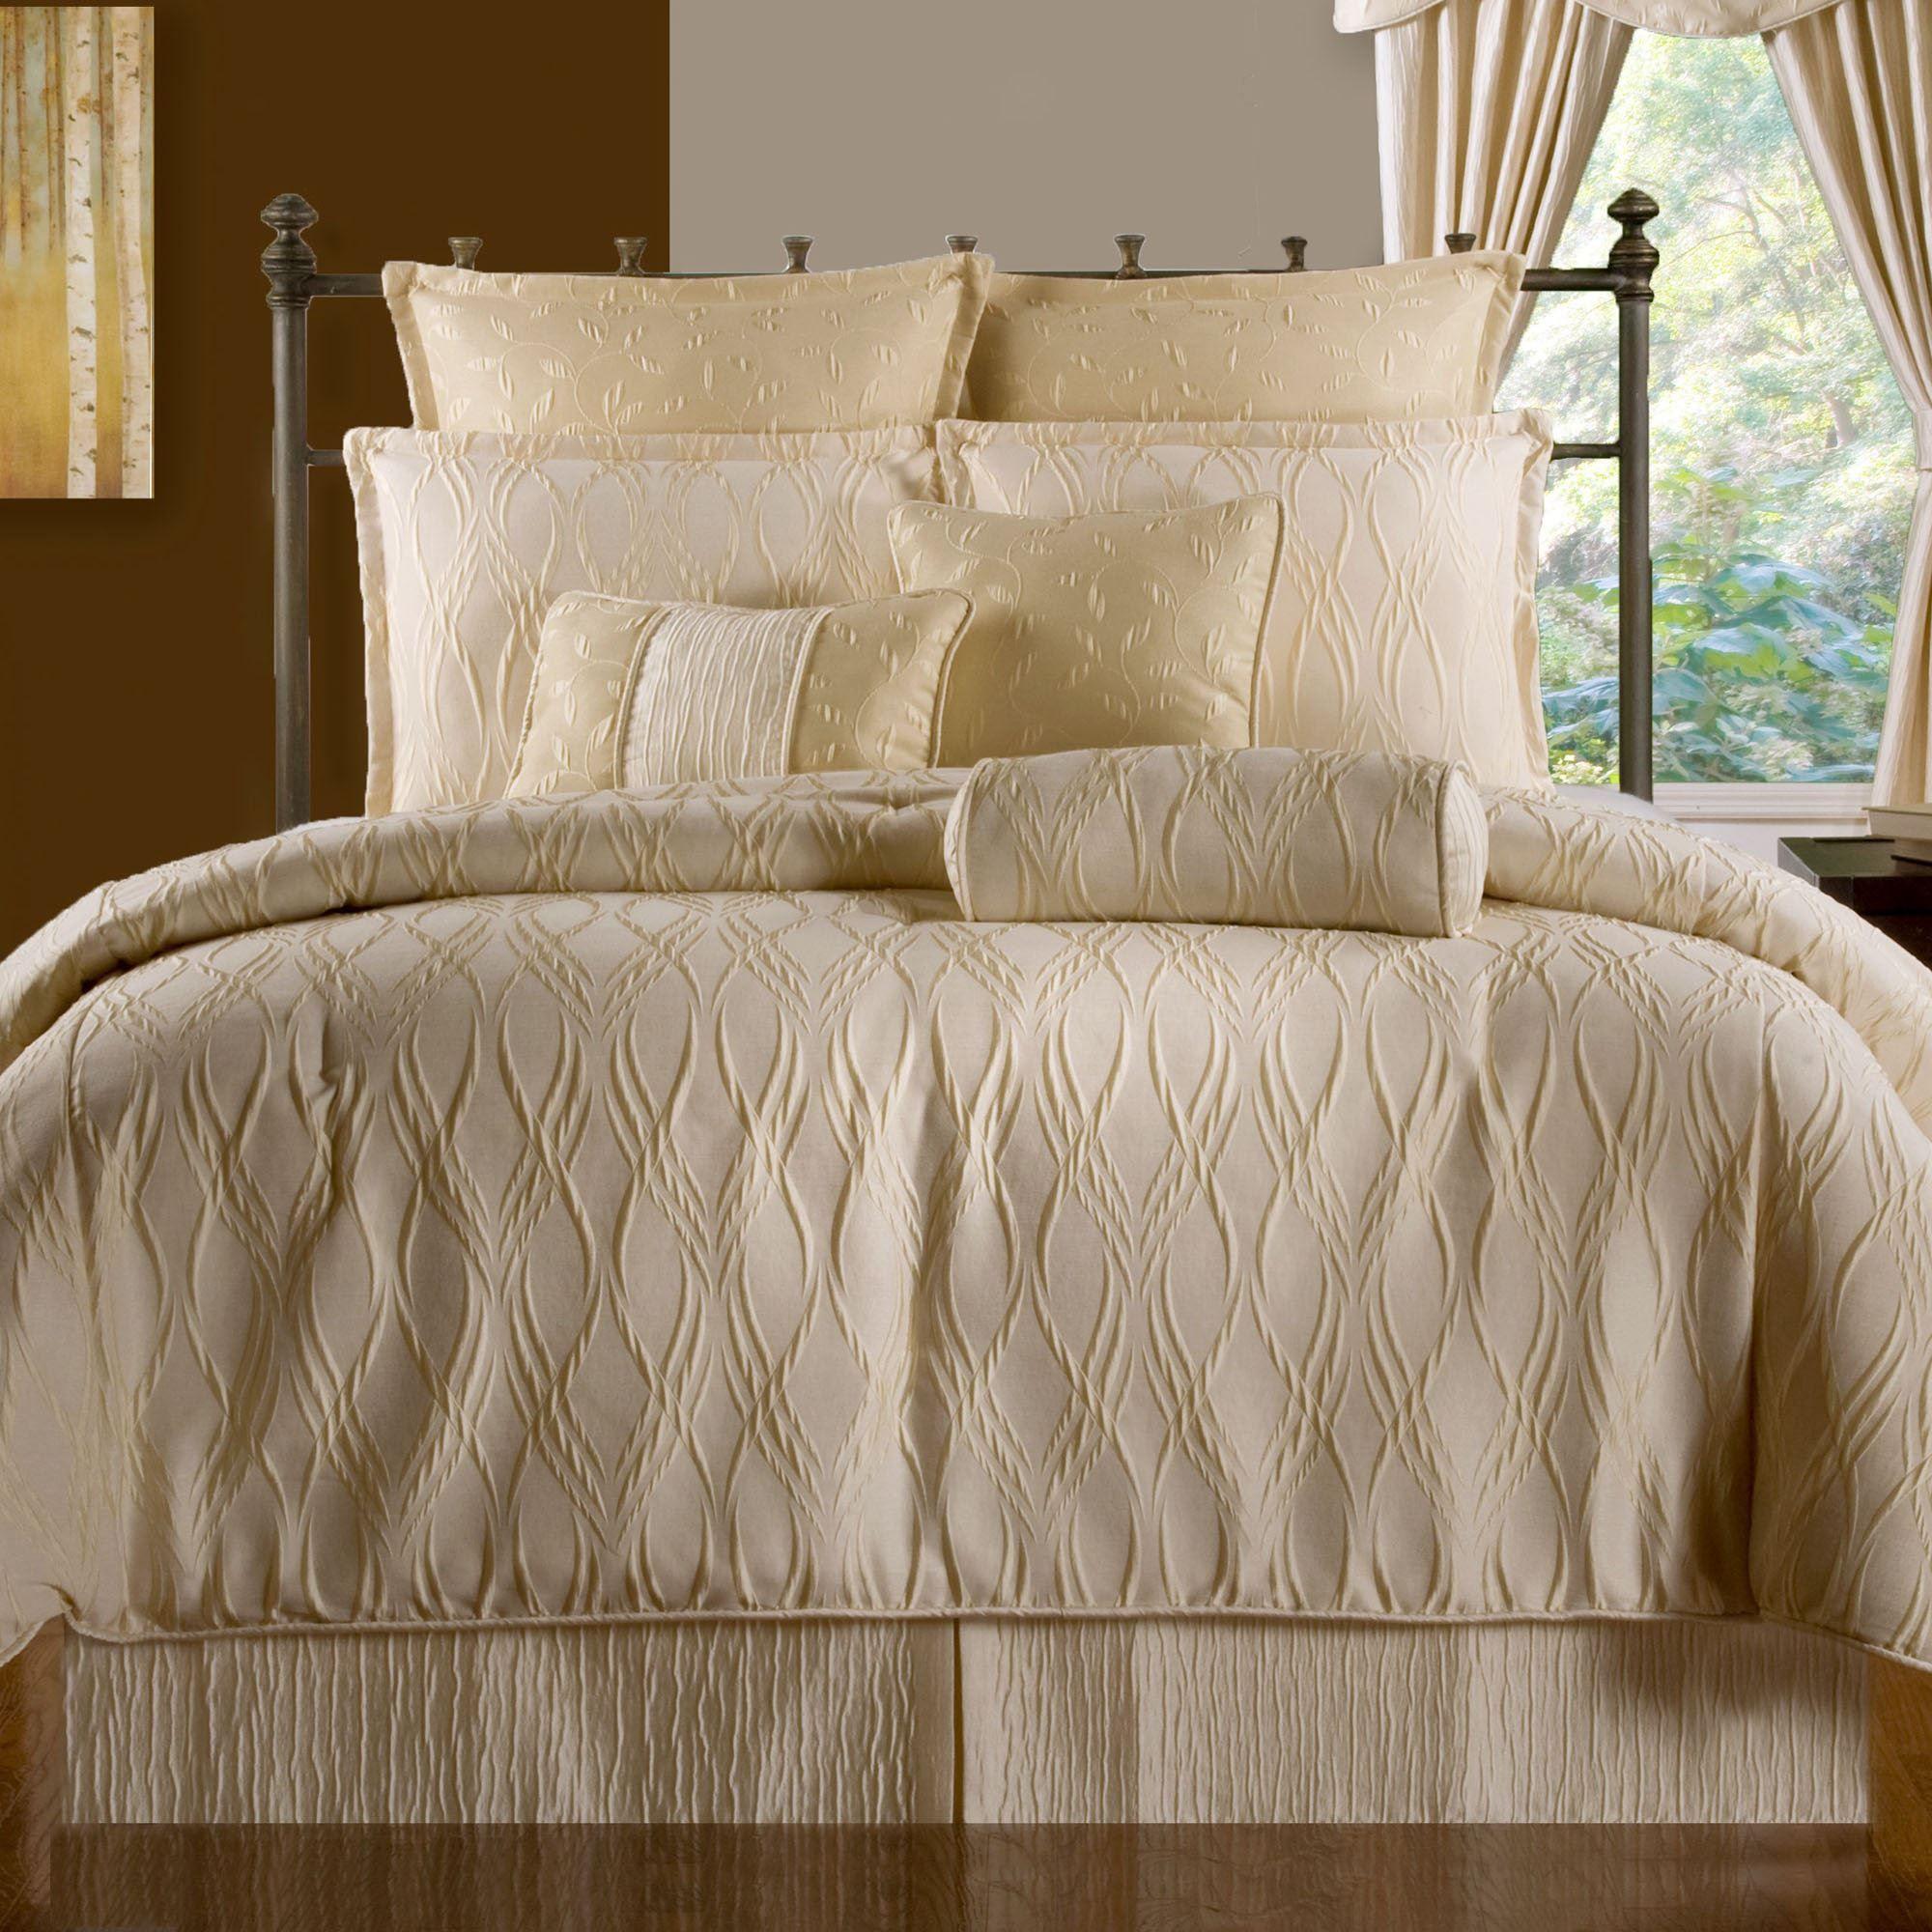 sonoma light cream comforter bedding | cream comforter, comforter